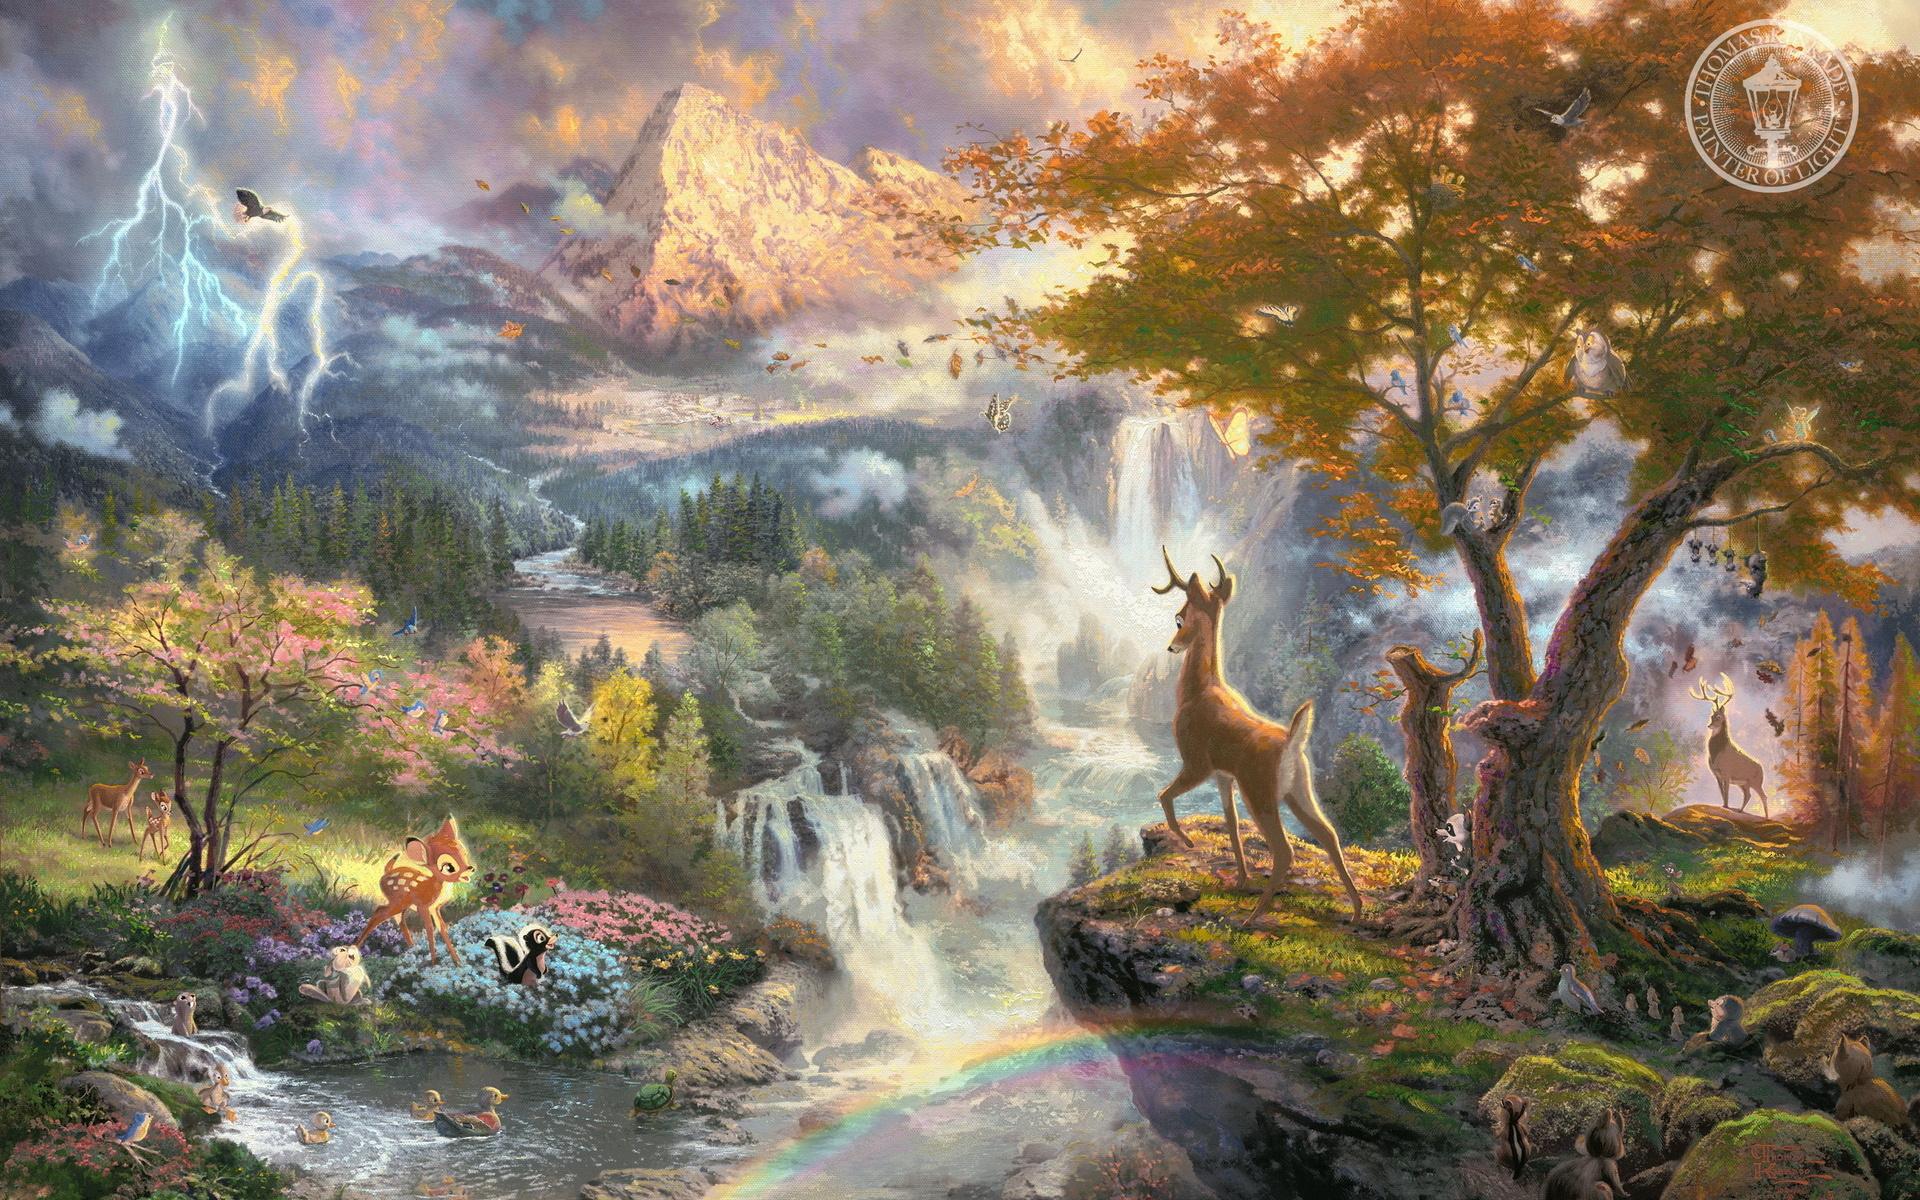 thomas kinkade kinkade disney cartoons movies landscapes nature bambie 1920x1200